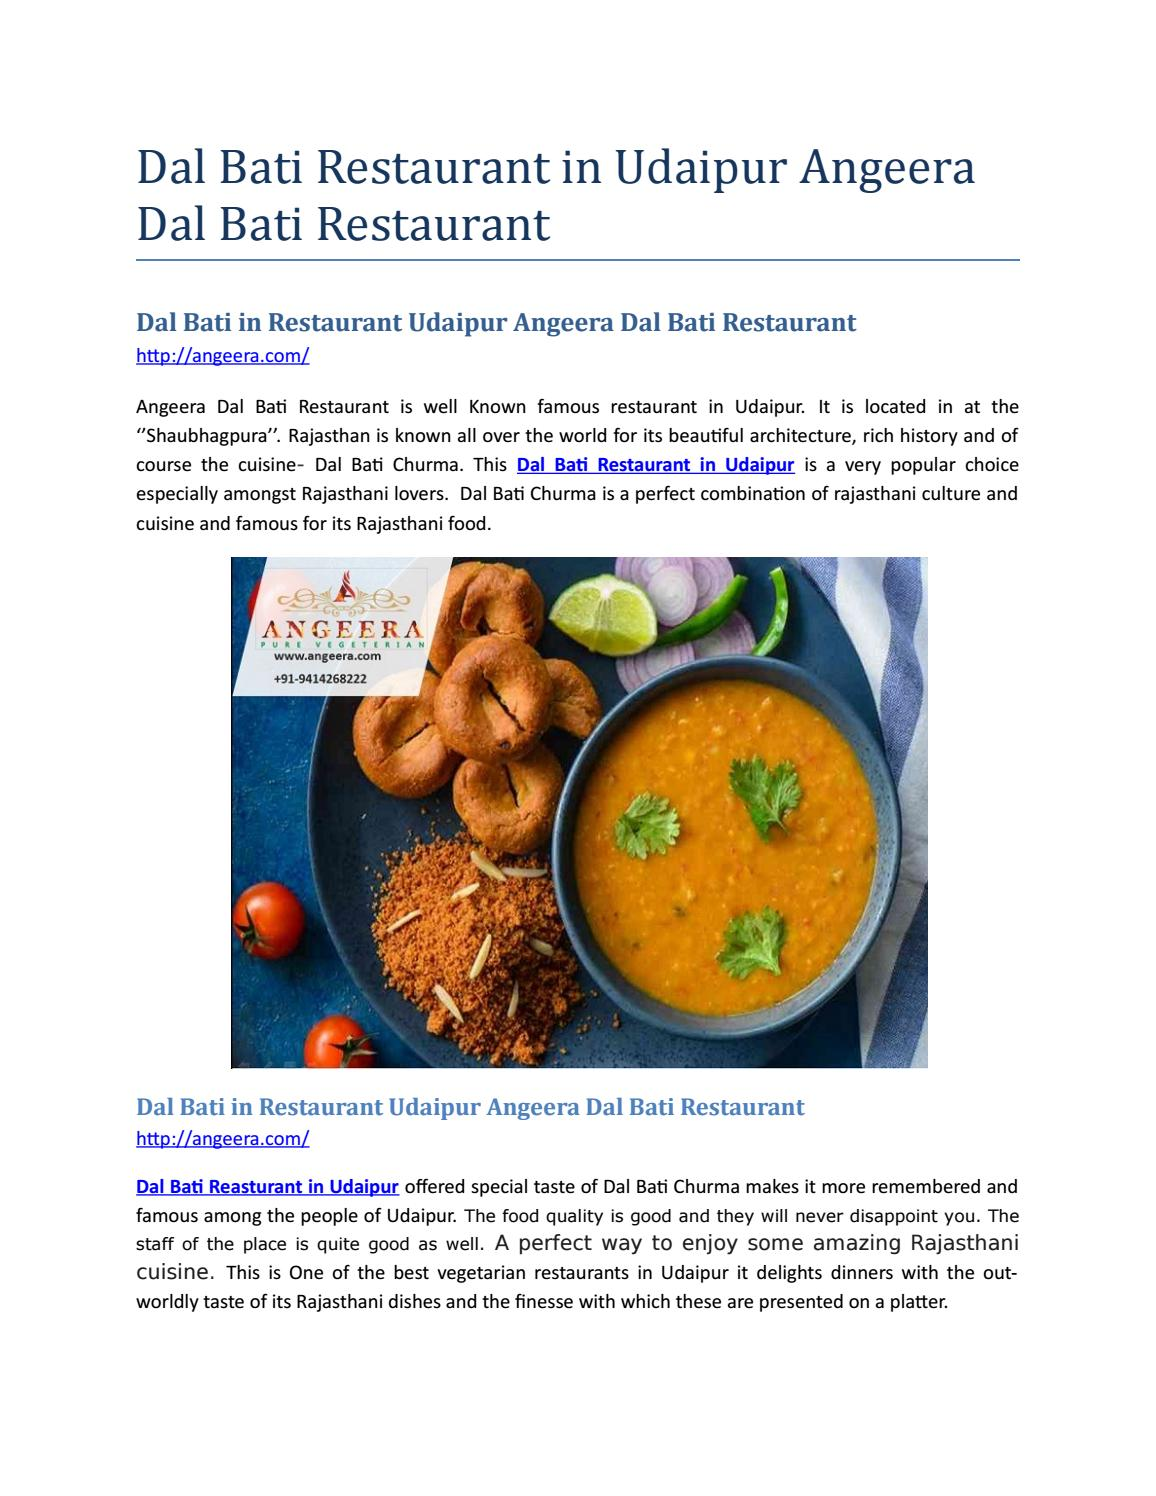 Dal Bati In Restaurant Udaipur Angeera Dal Bati Restaurant By